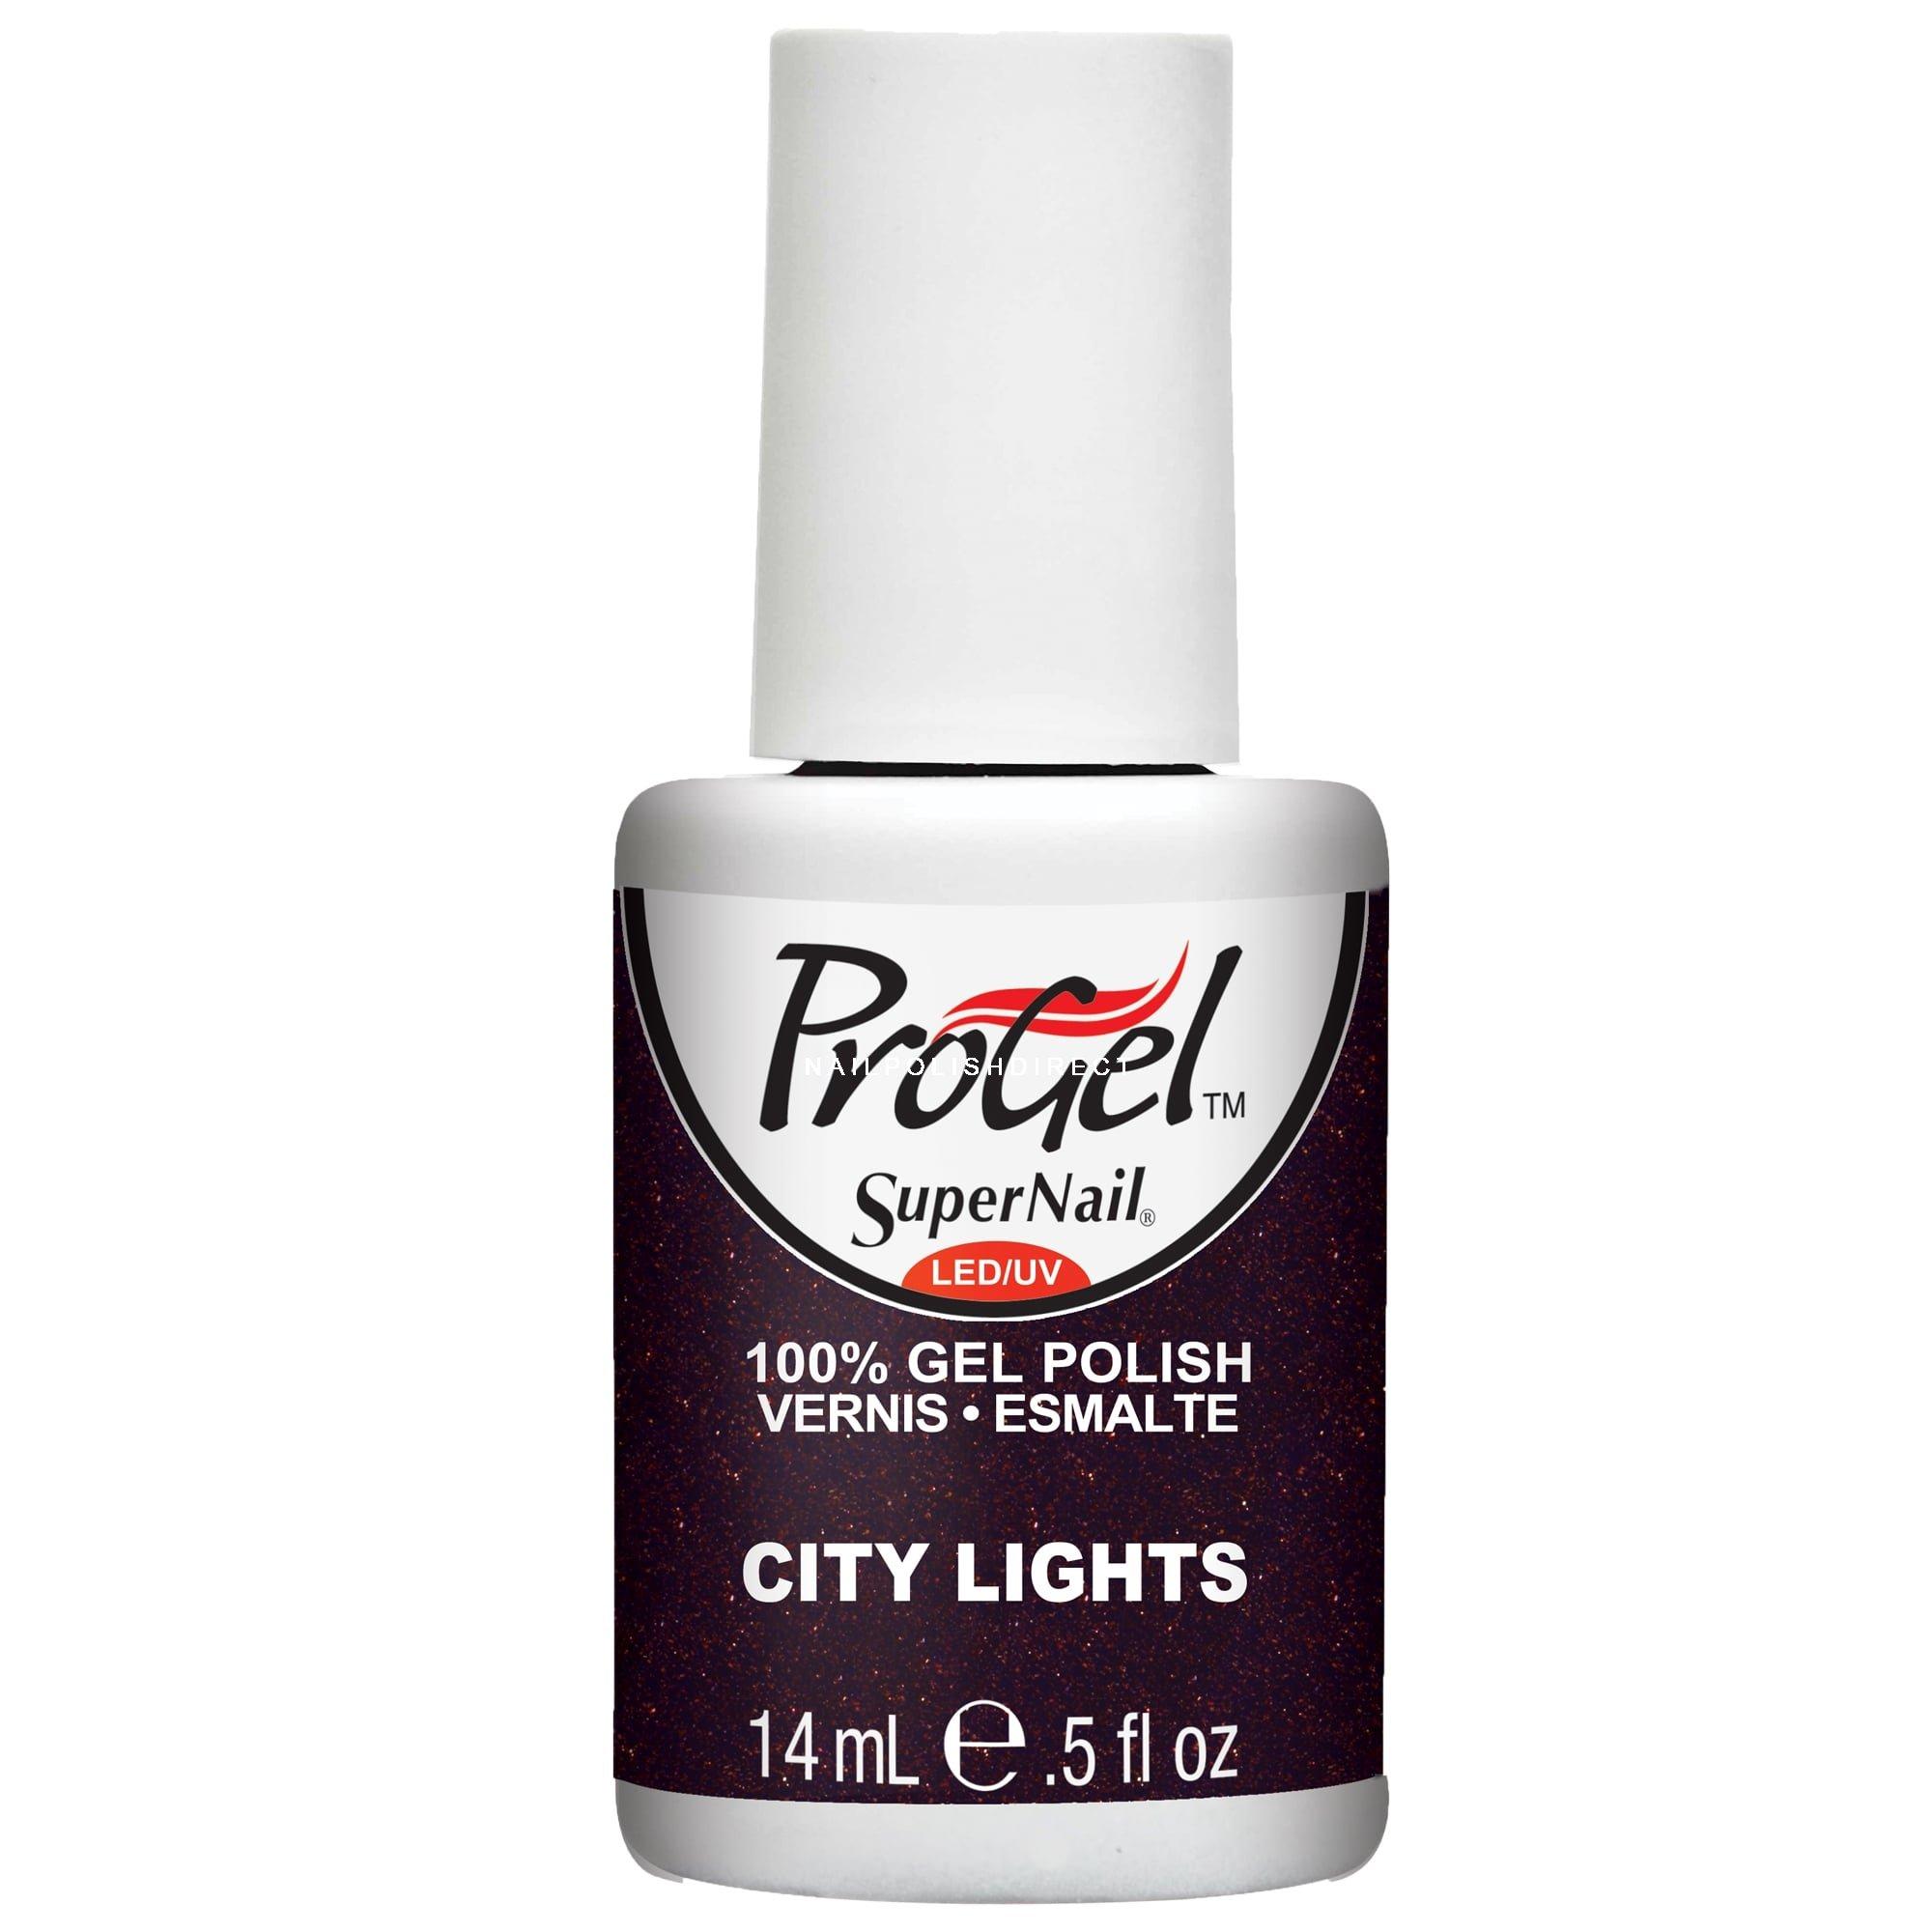 How to polish the lights